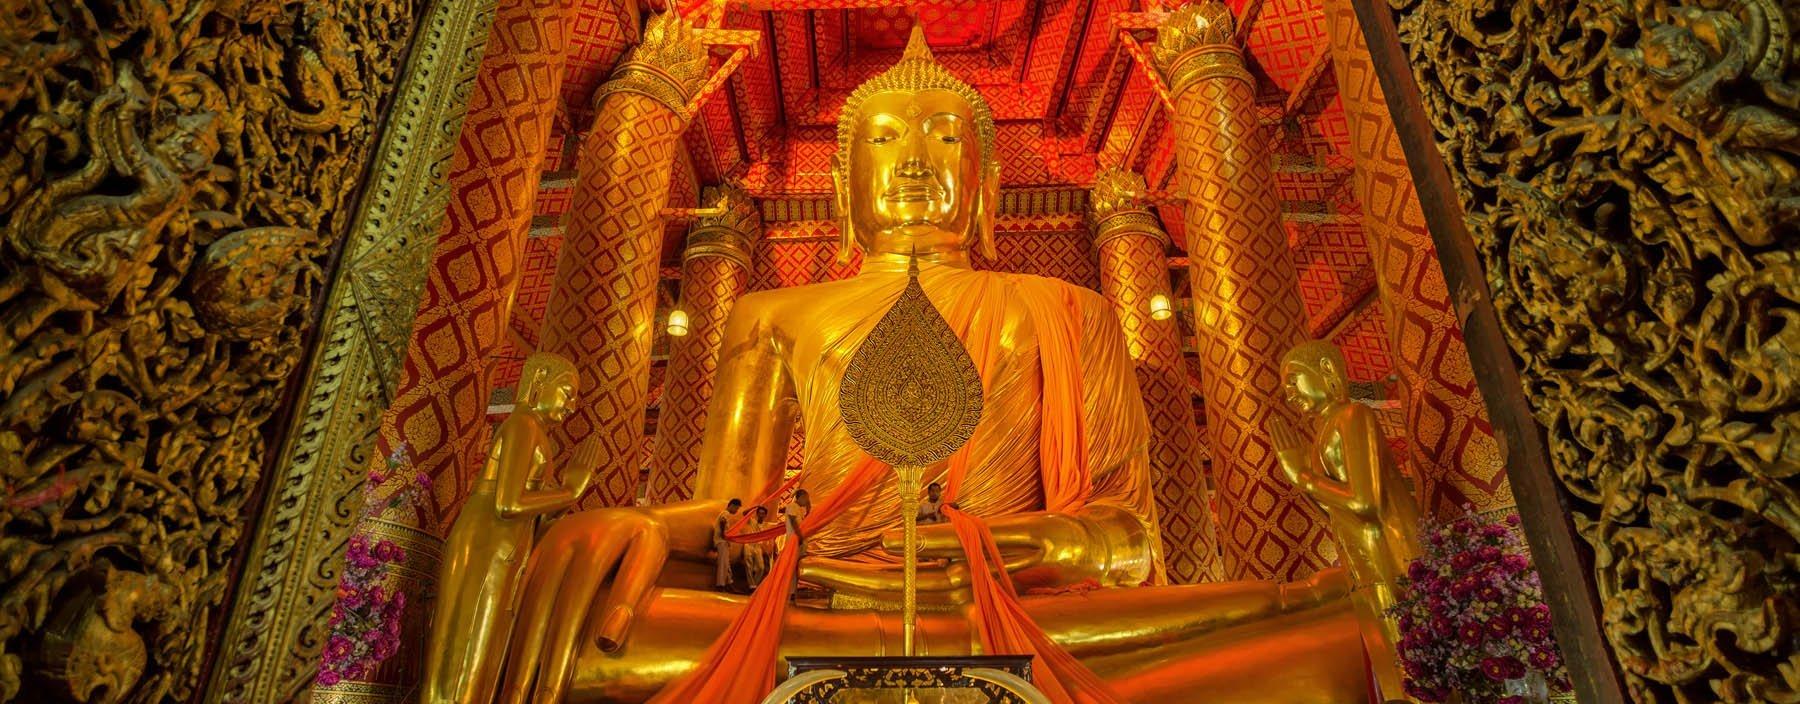 th, ayutthaya, wat phanan choeng (2).jpg